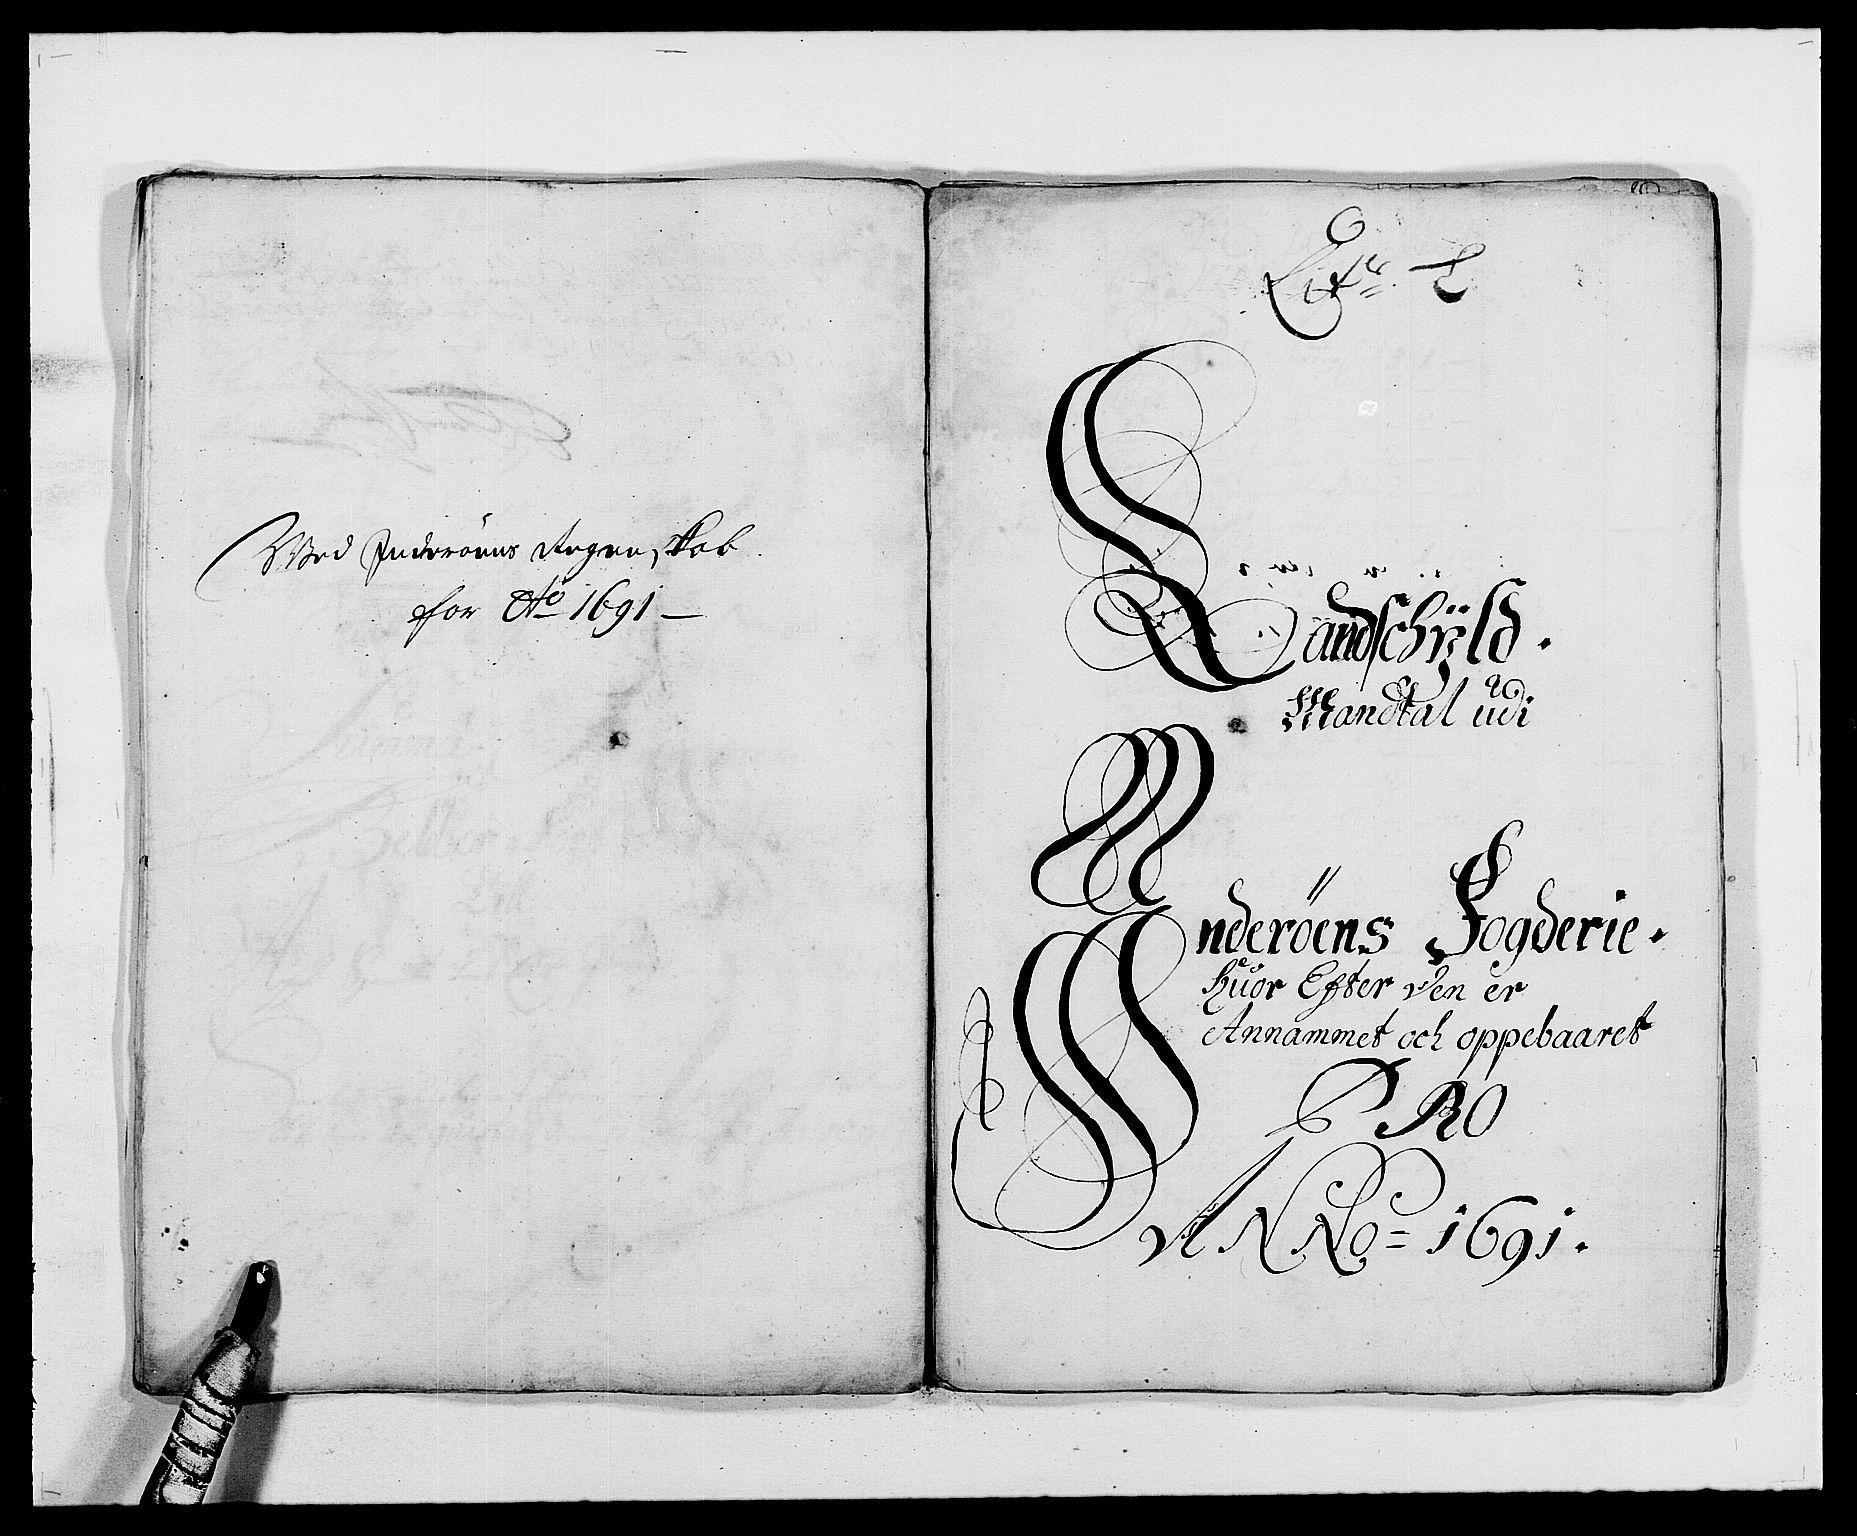 RA, Rentekammeret inntil 1814, Reviderte regnskaper, Fogderegnskap, R63/L4307: Fogderegnskap Inderøy, 1690-1691, s. 370